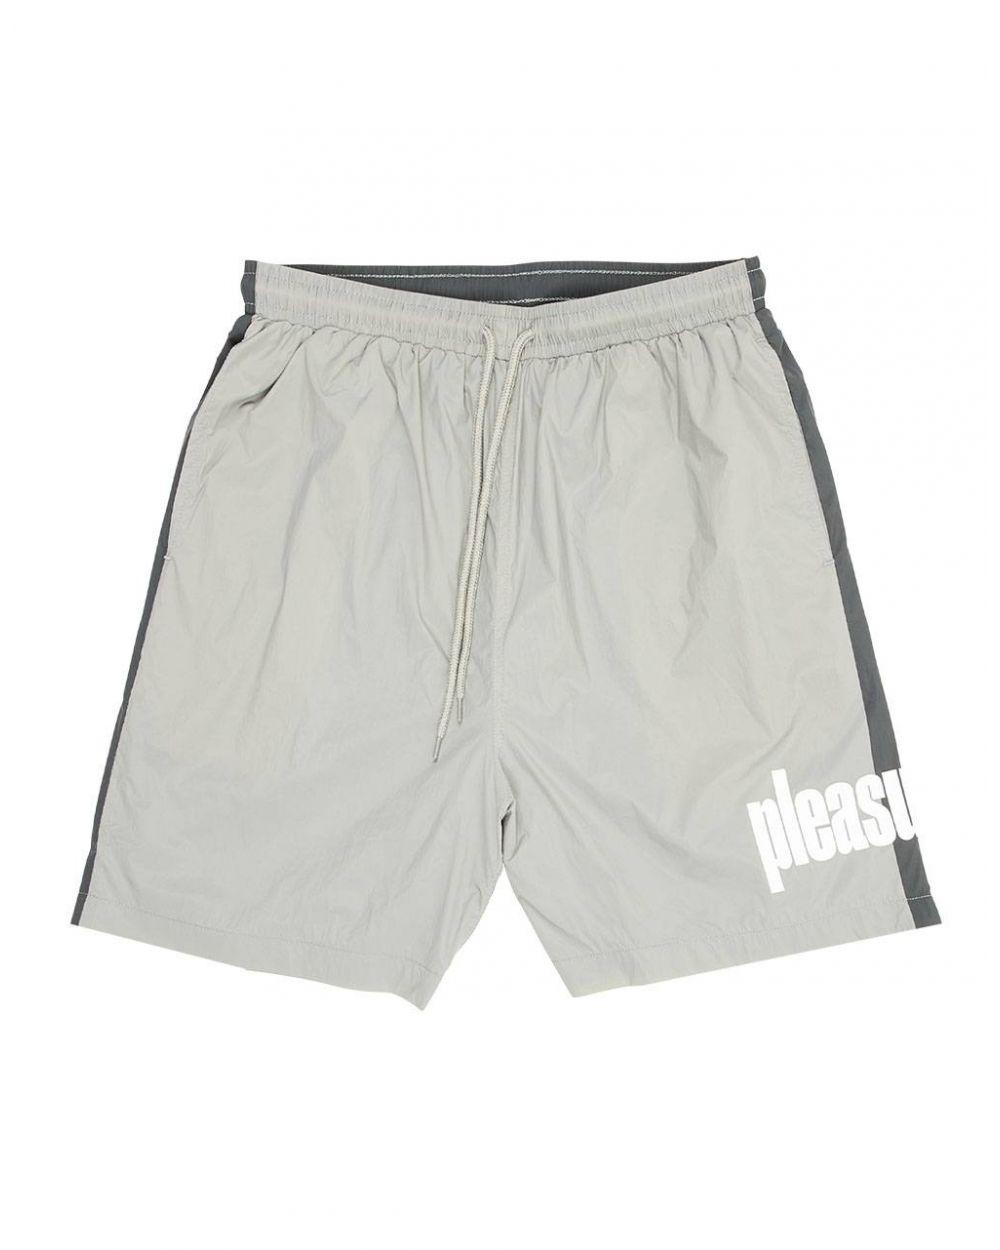 Pleasures Active shorts - black Pleasures Shorts 72,95€